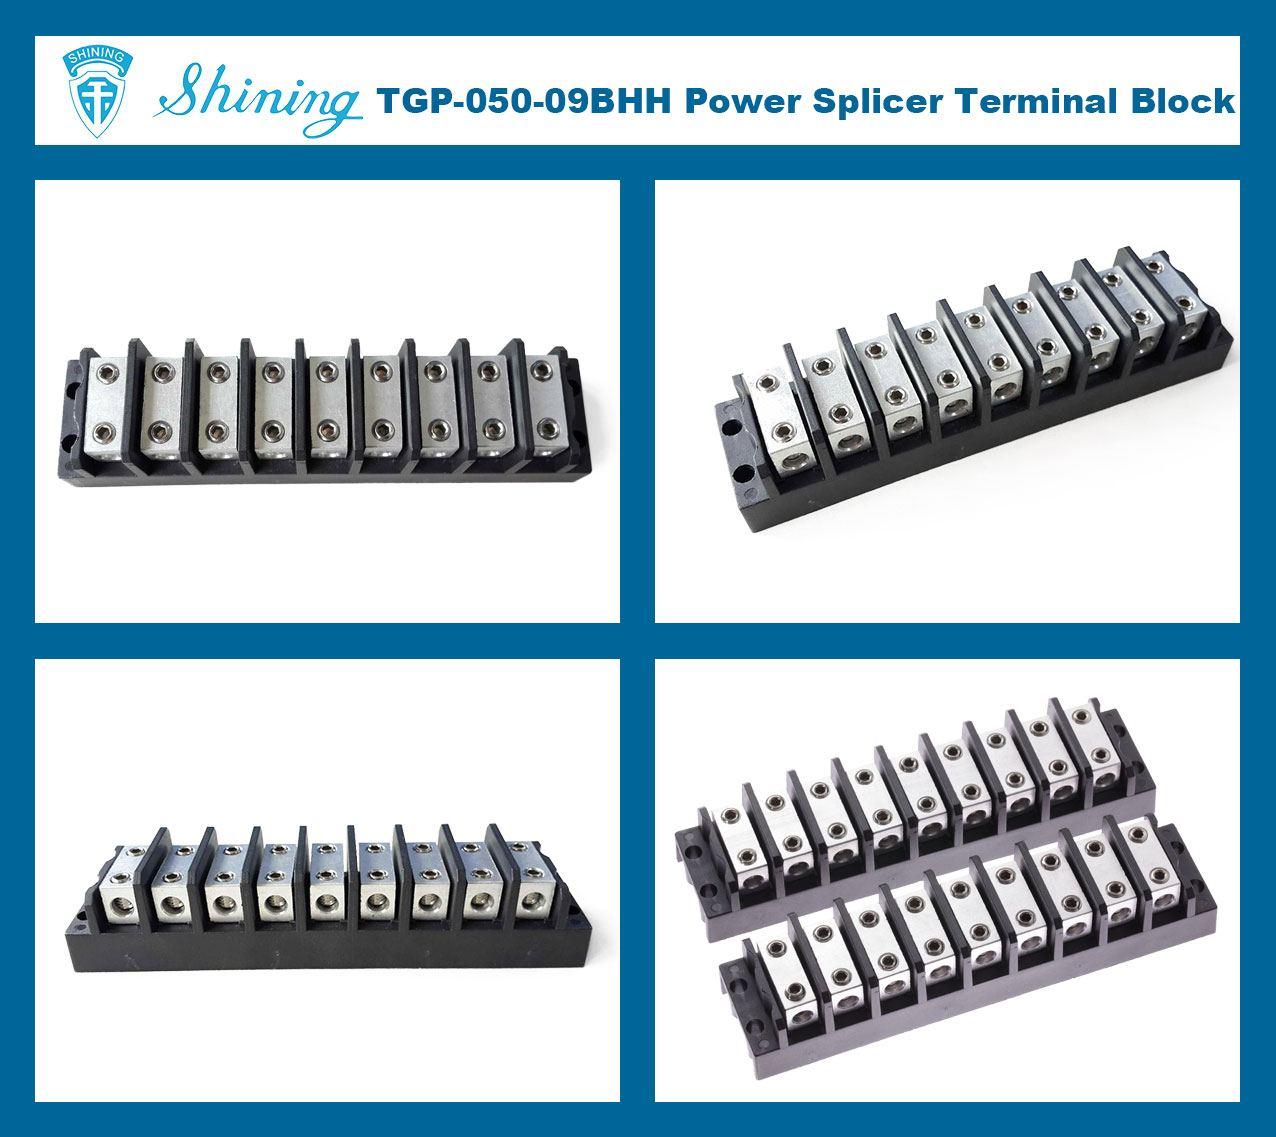 TGP-050-09BHH 600V 50A 9 Way Power Splicer Terminal Block